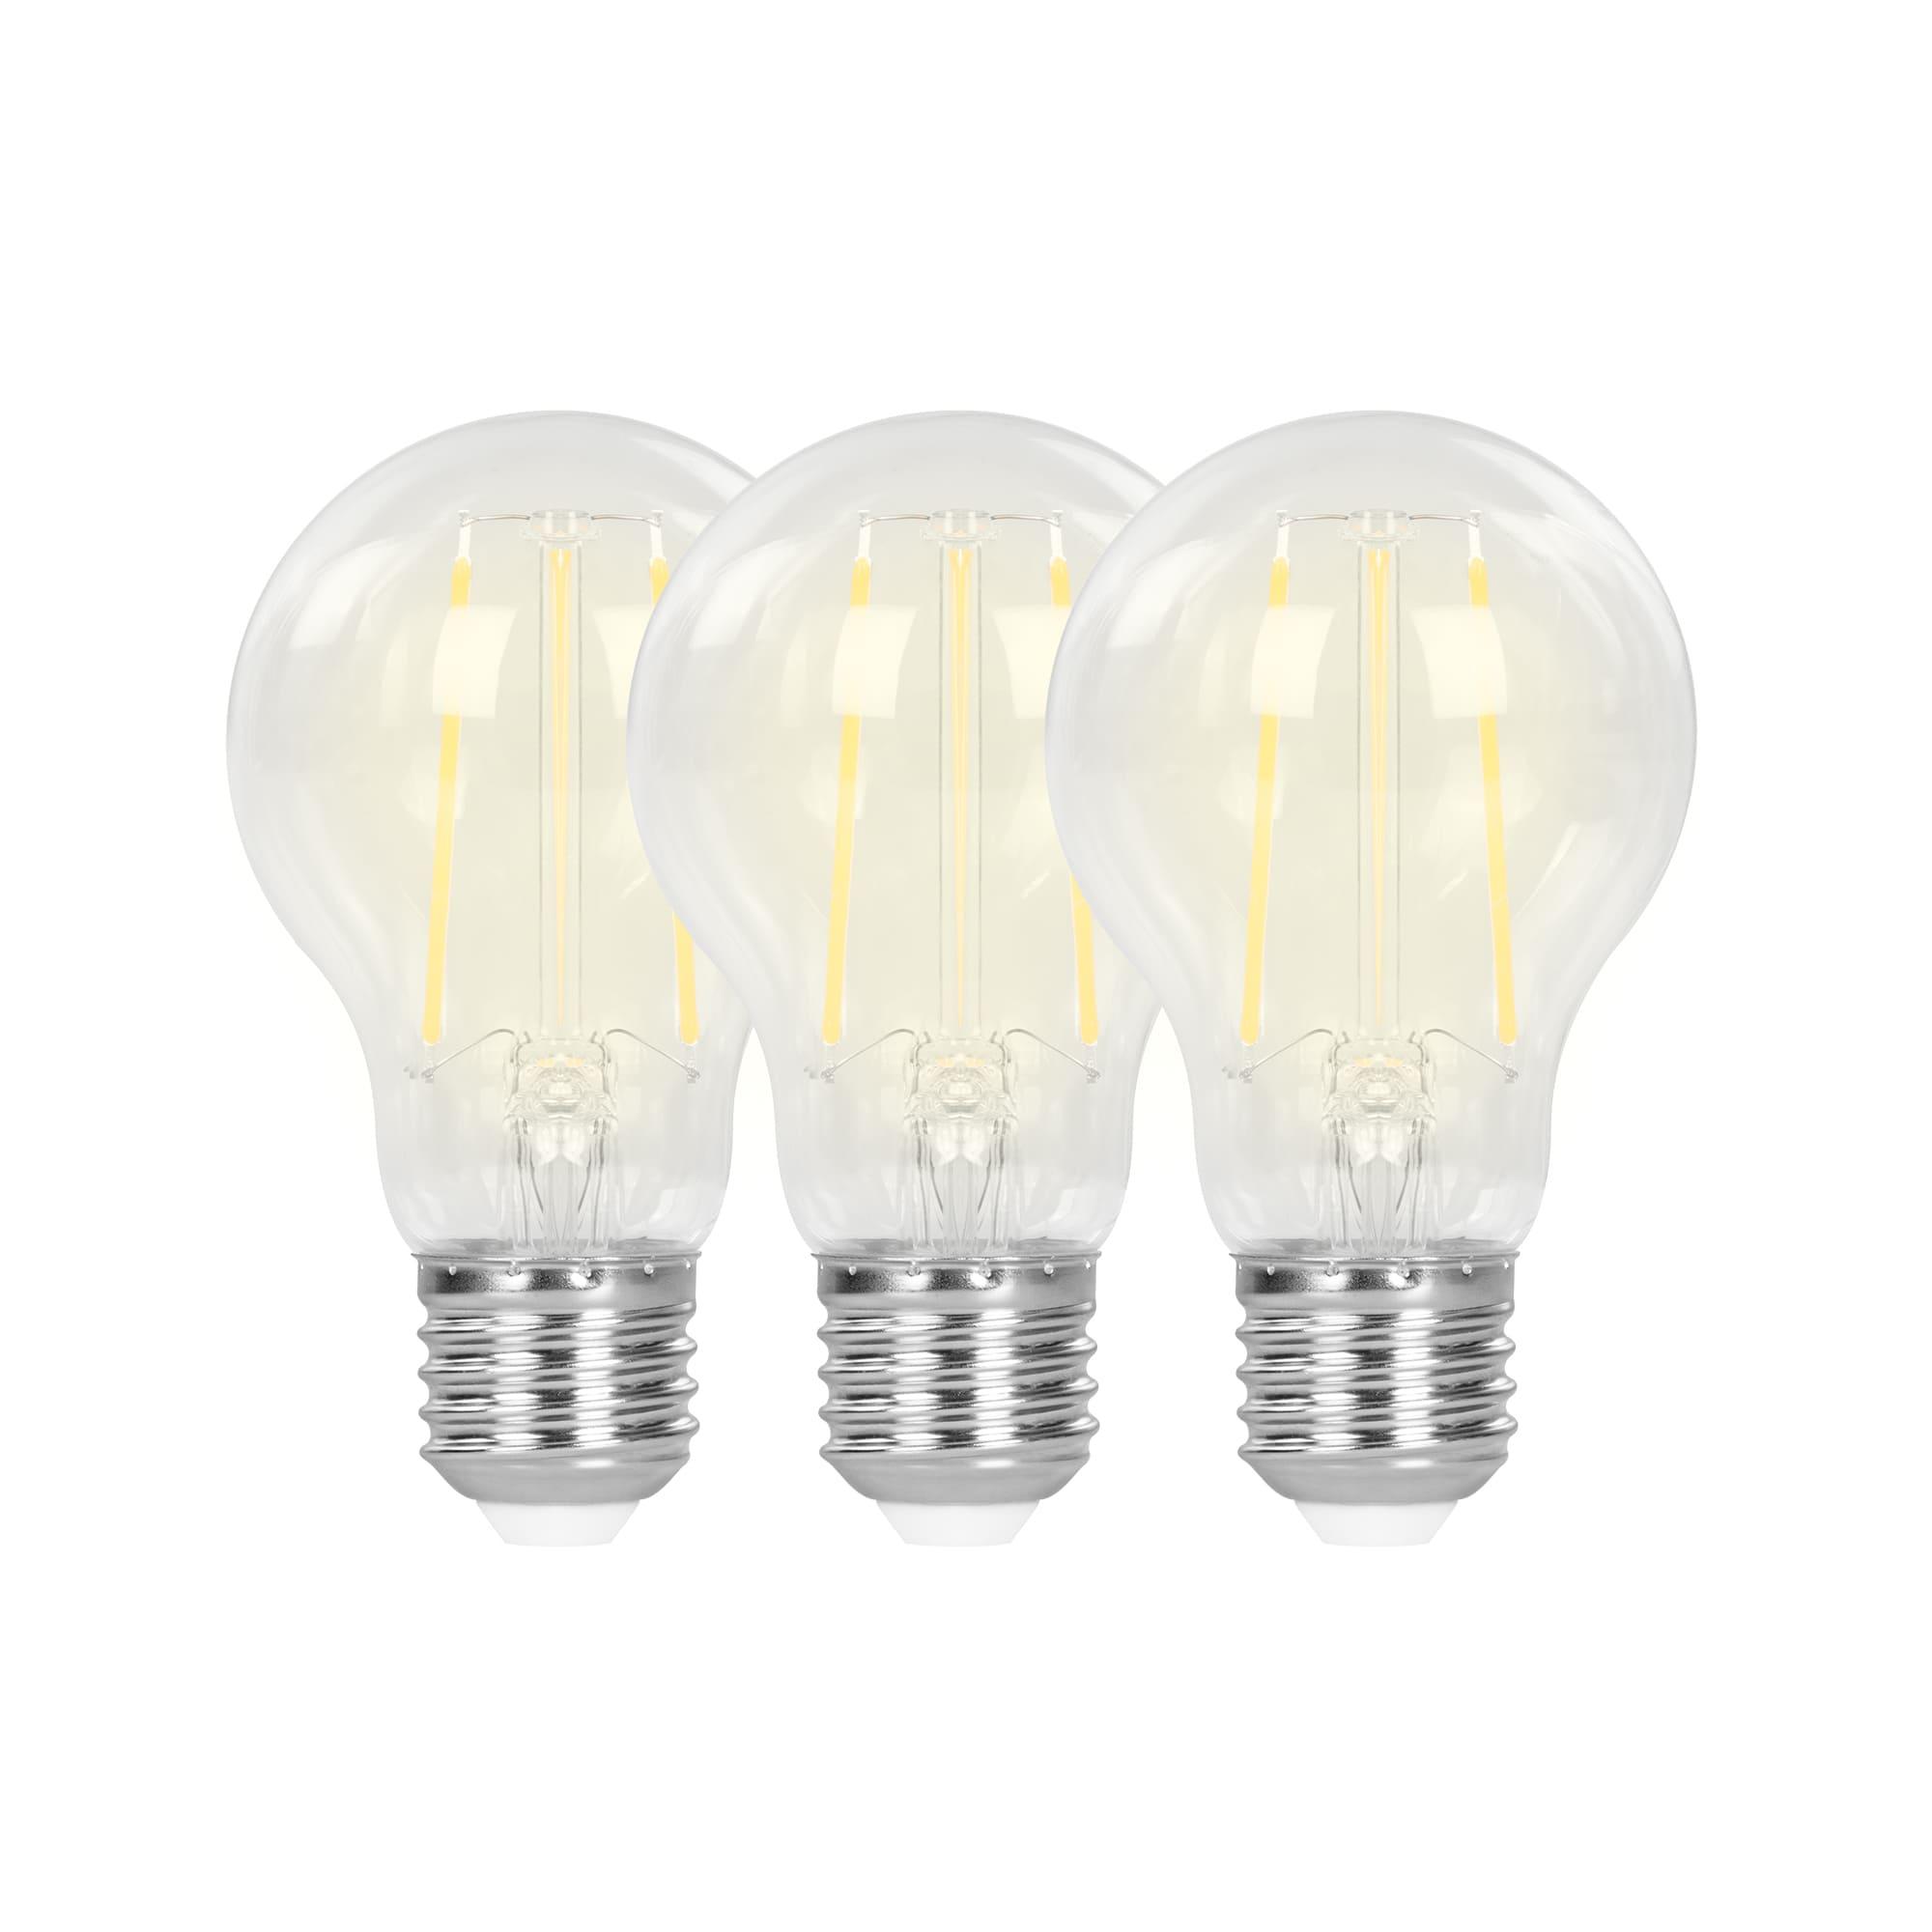 Hombli Slimme Filament Lamp E27 7W WiFi 3 pack